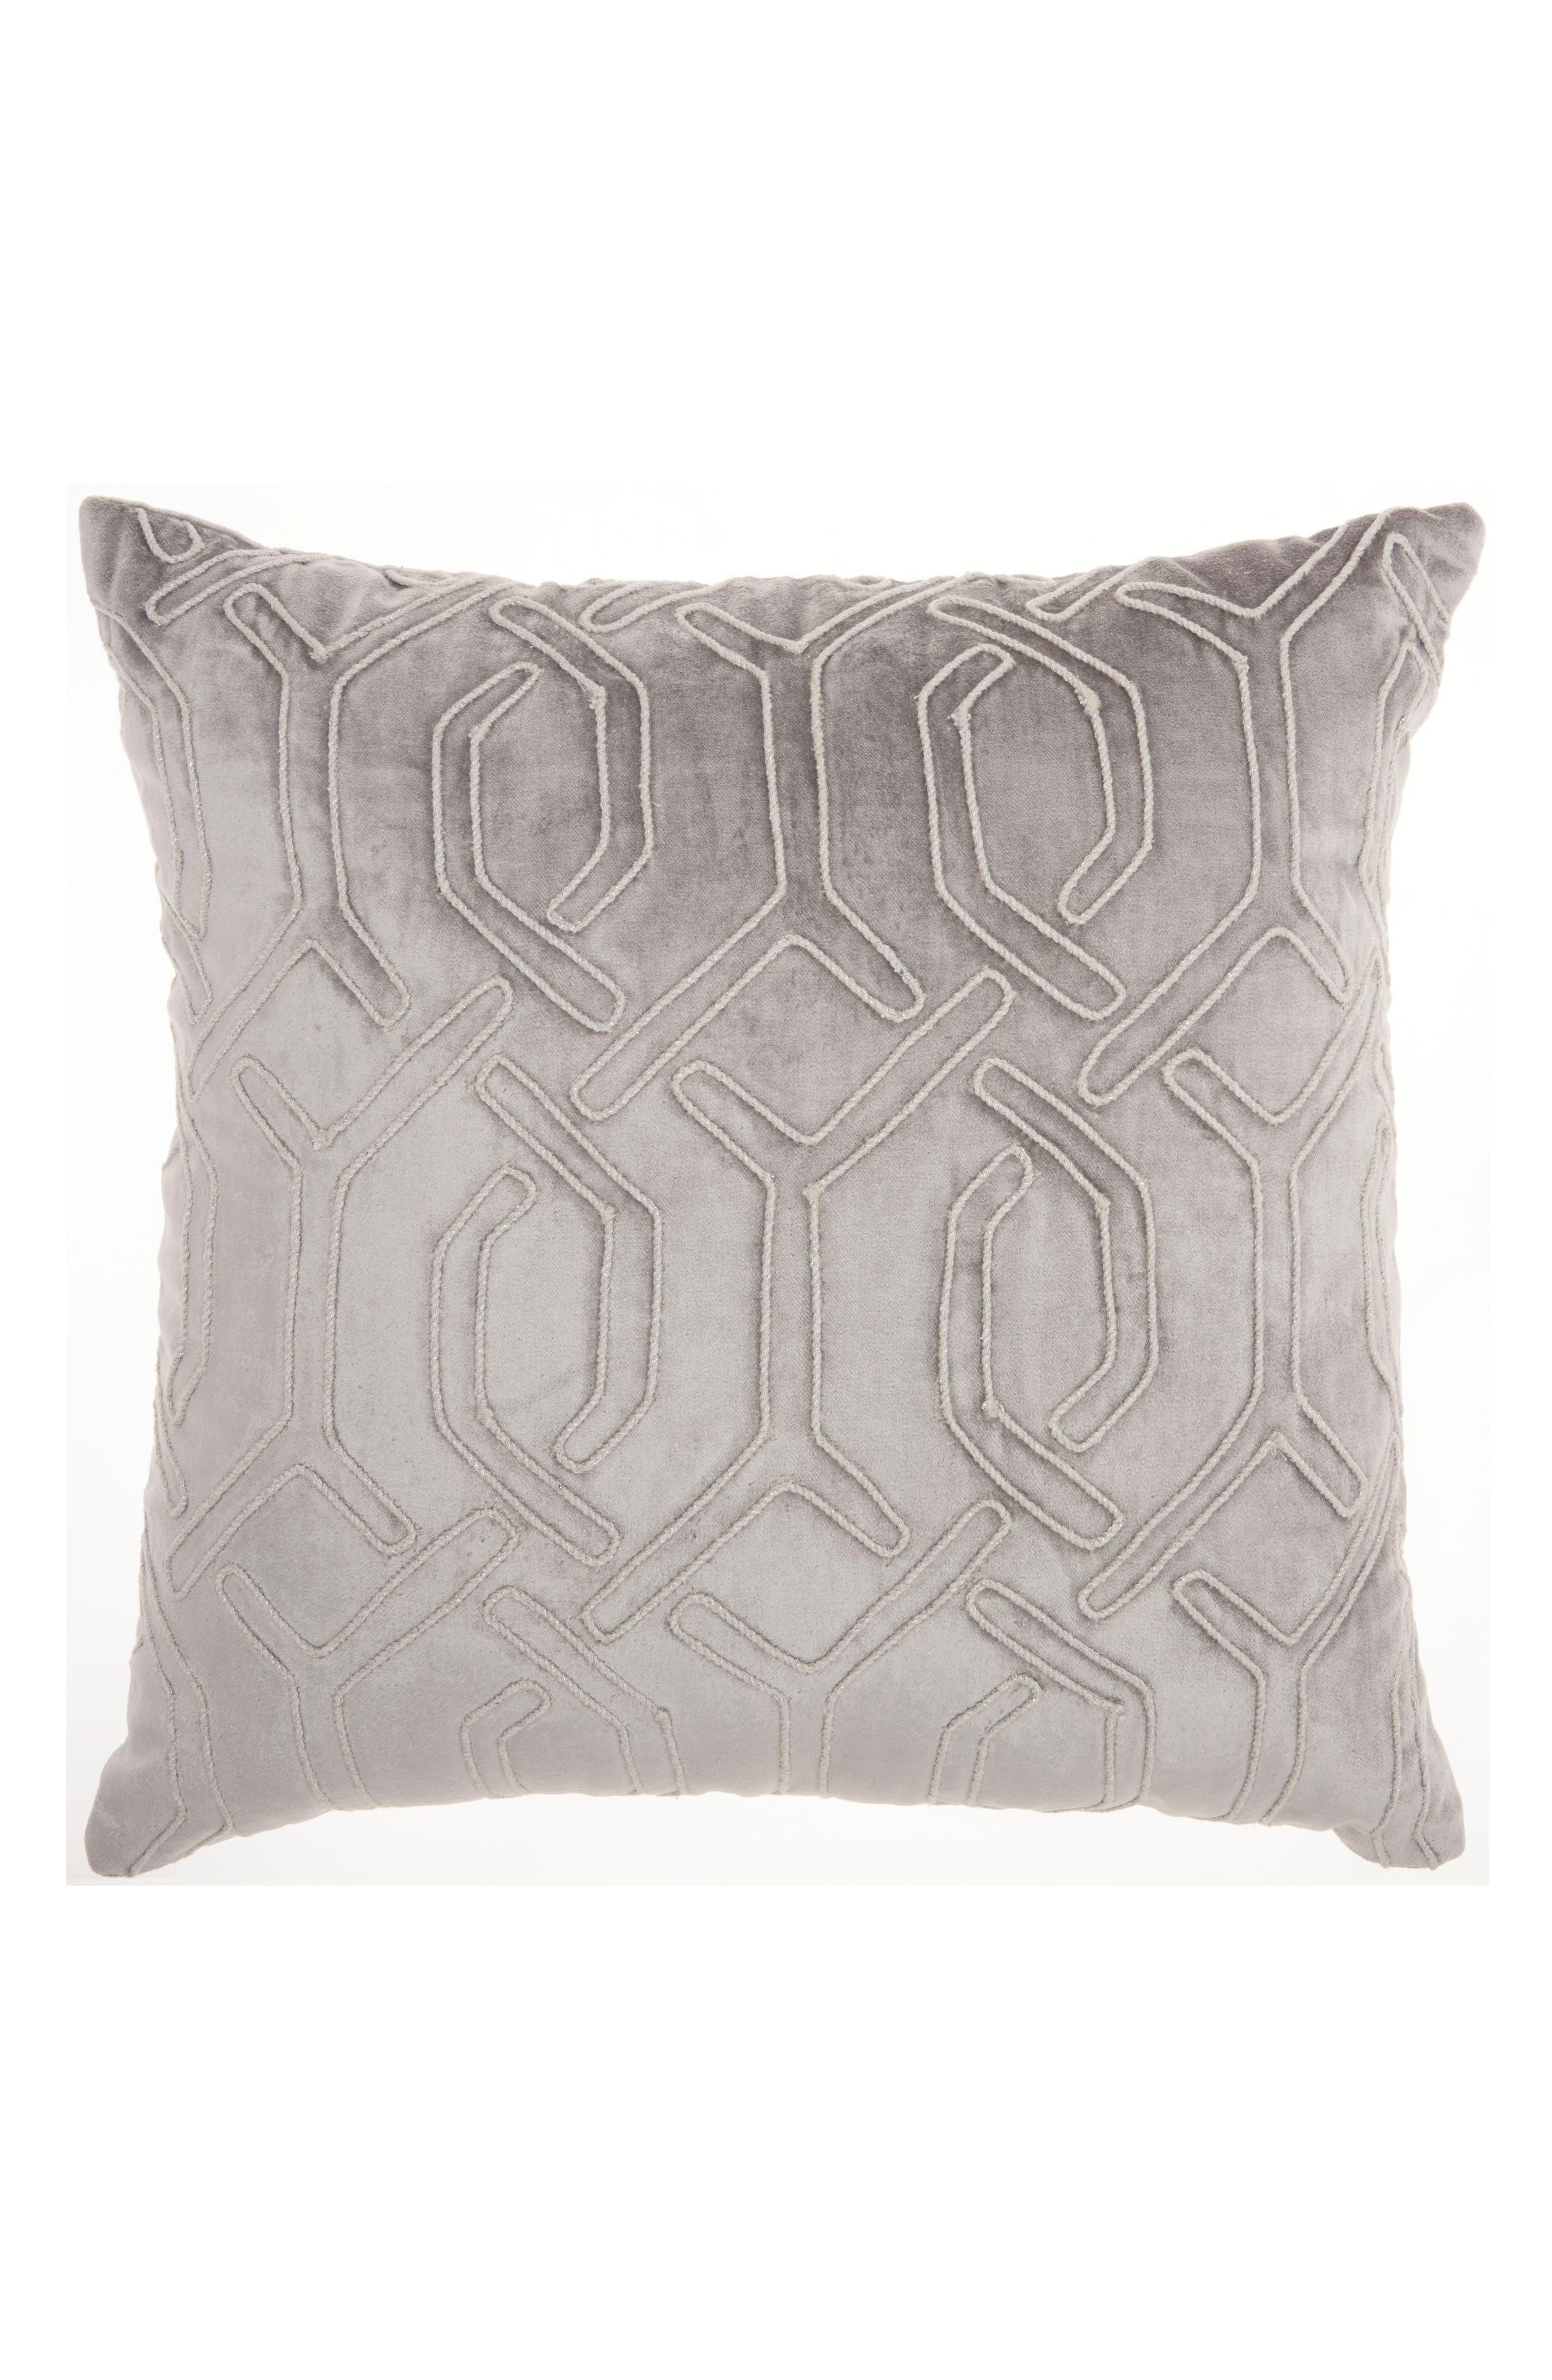 Mina Victory Velvet Gate Accent Pillow